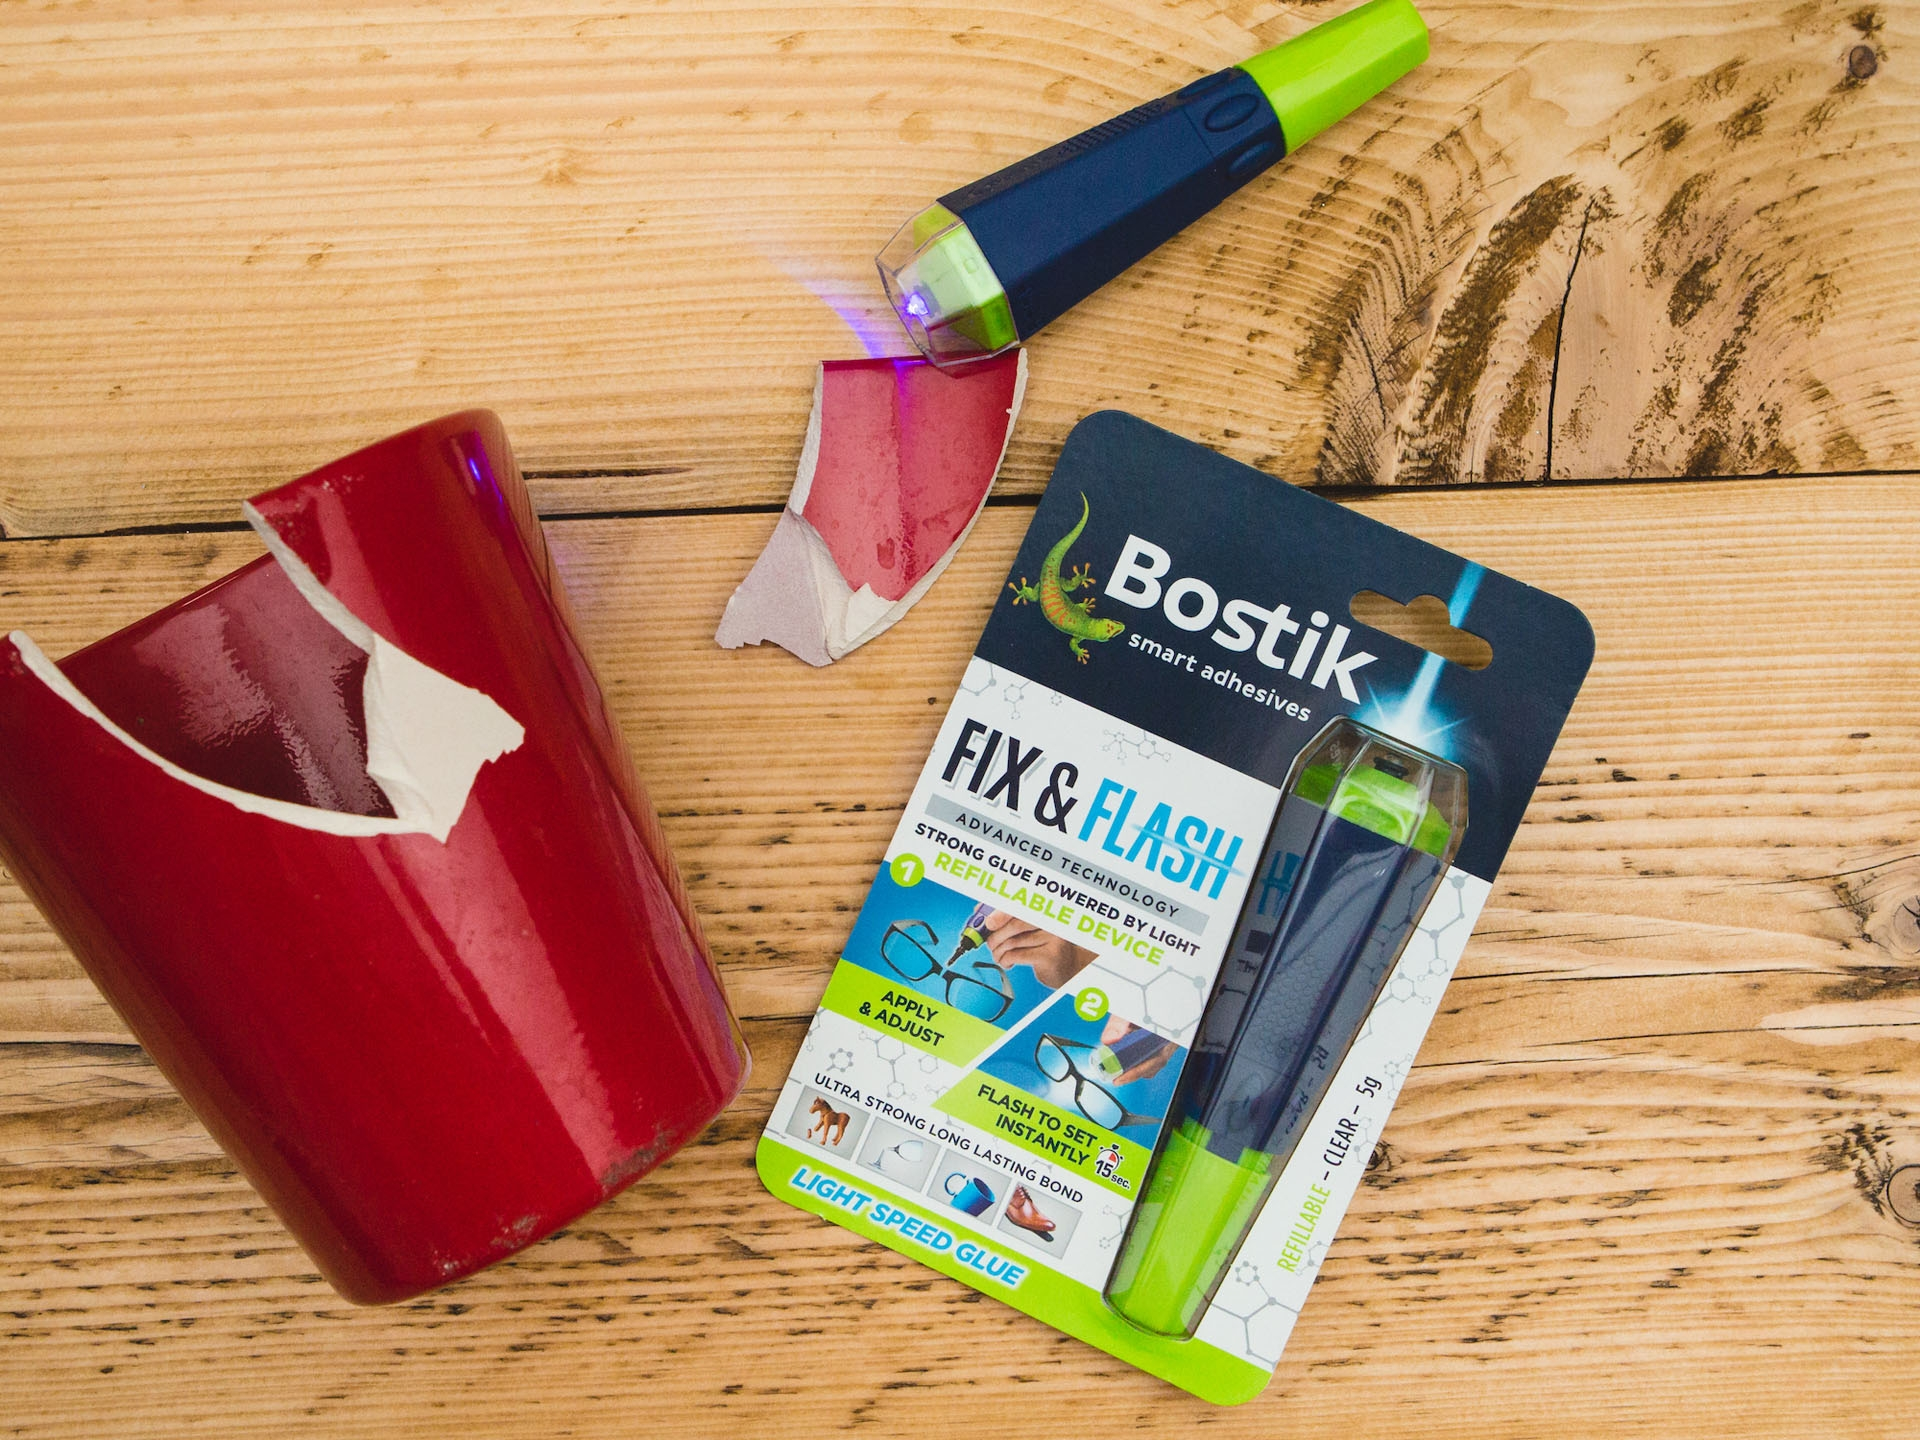 Bostik DIY Fix and Flash Device United Kingdom Impression image version 3